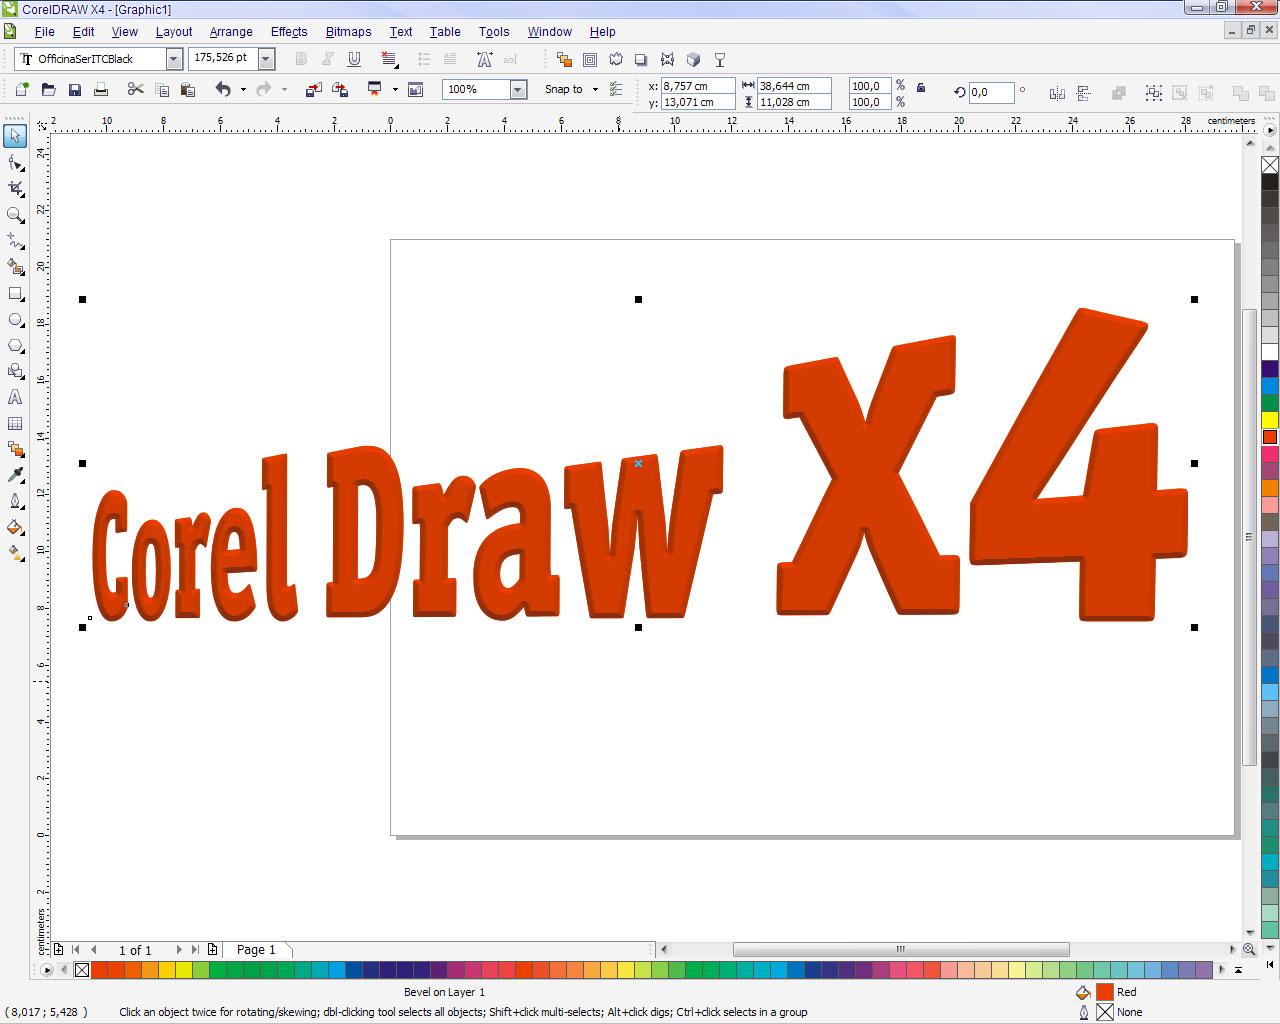 Coreldraw x4 windows 10 - Coreldraw X4 Windows 10 37